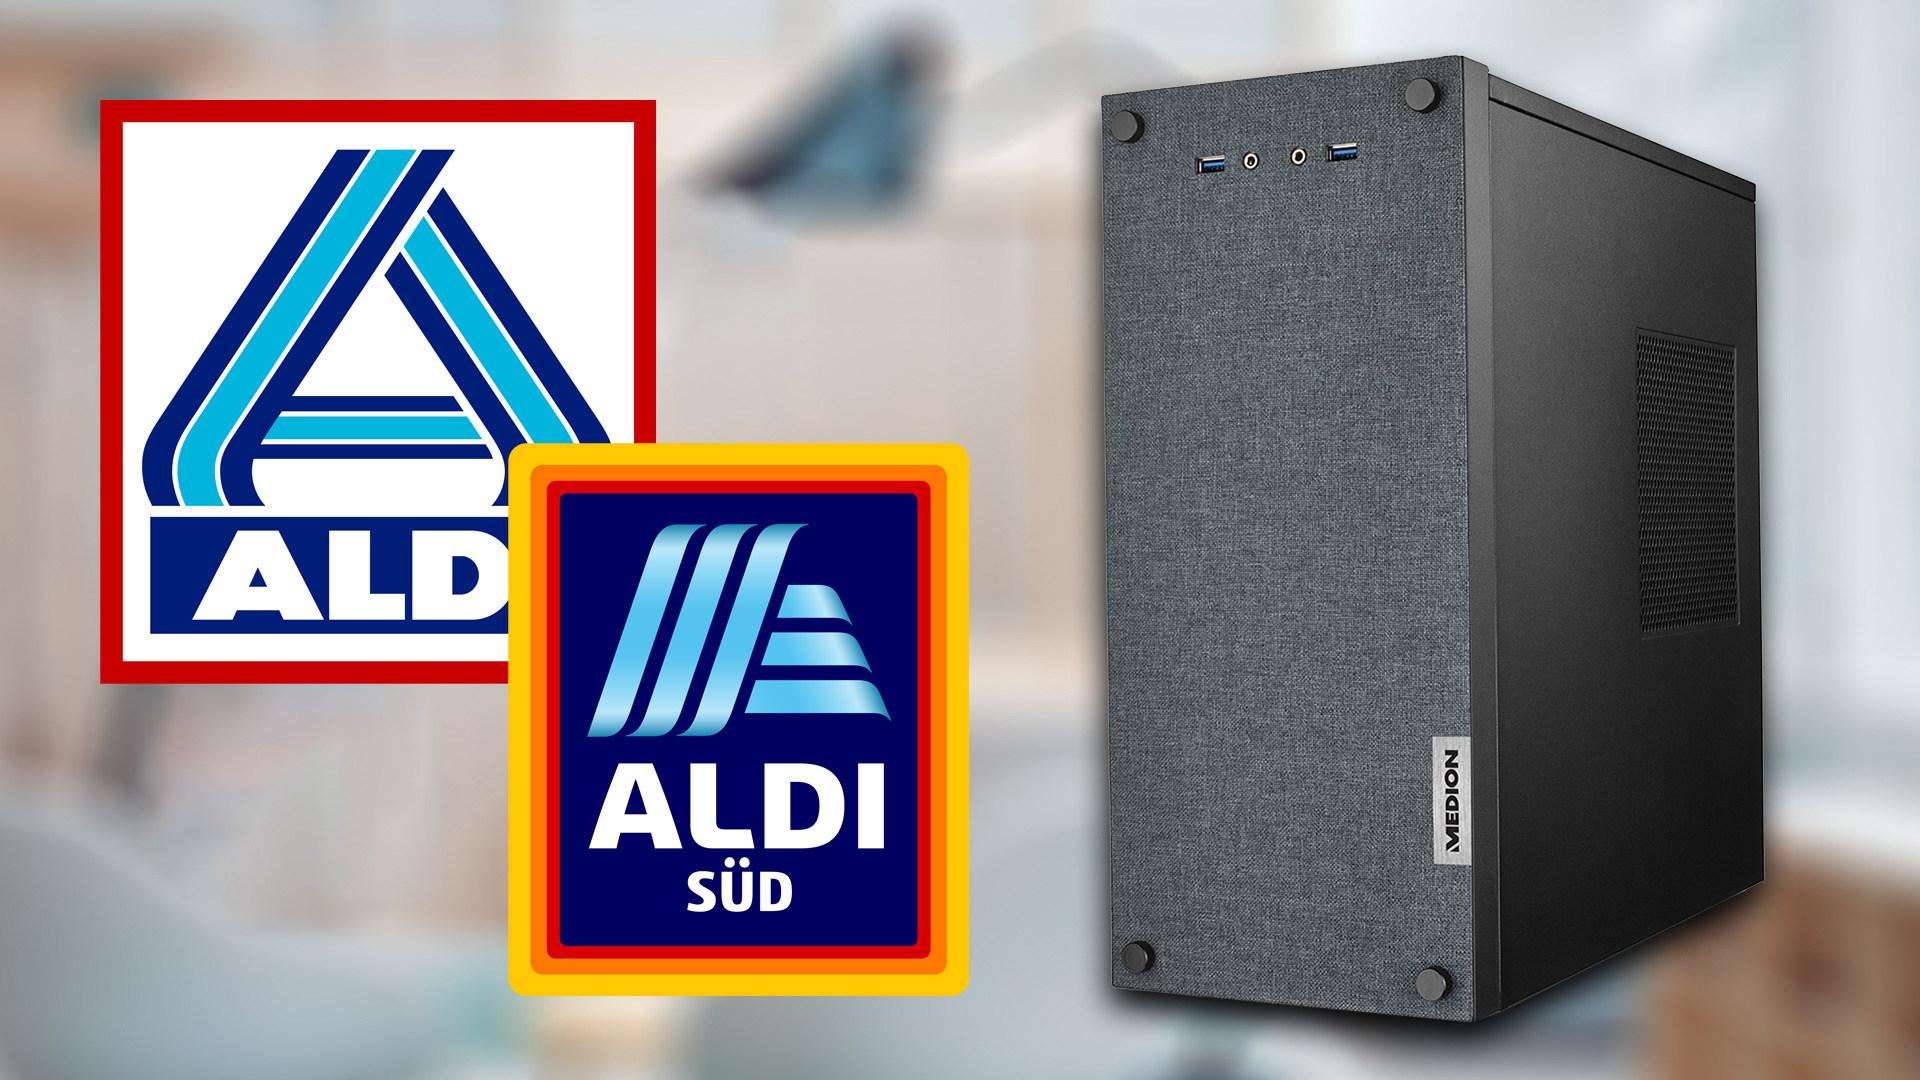 Neue Aldi-PCs: Günstige Multimedia-Desktops und Laptops ab 28.10.